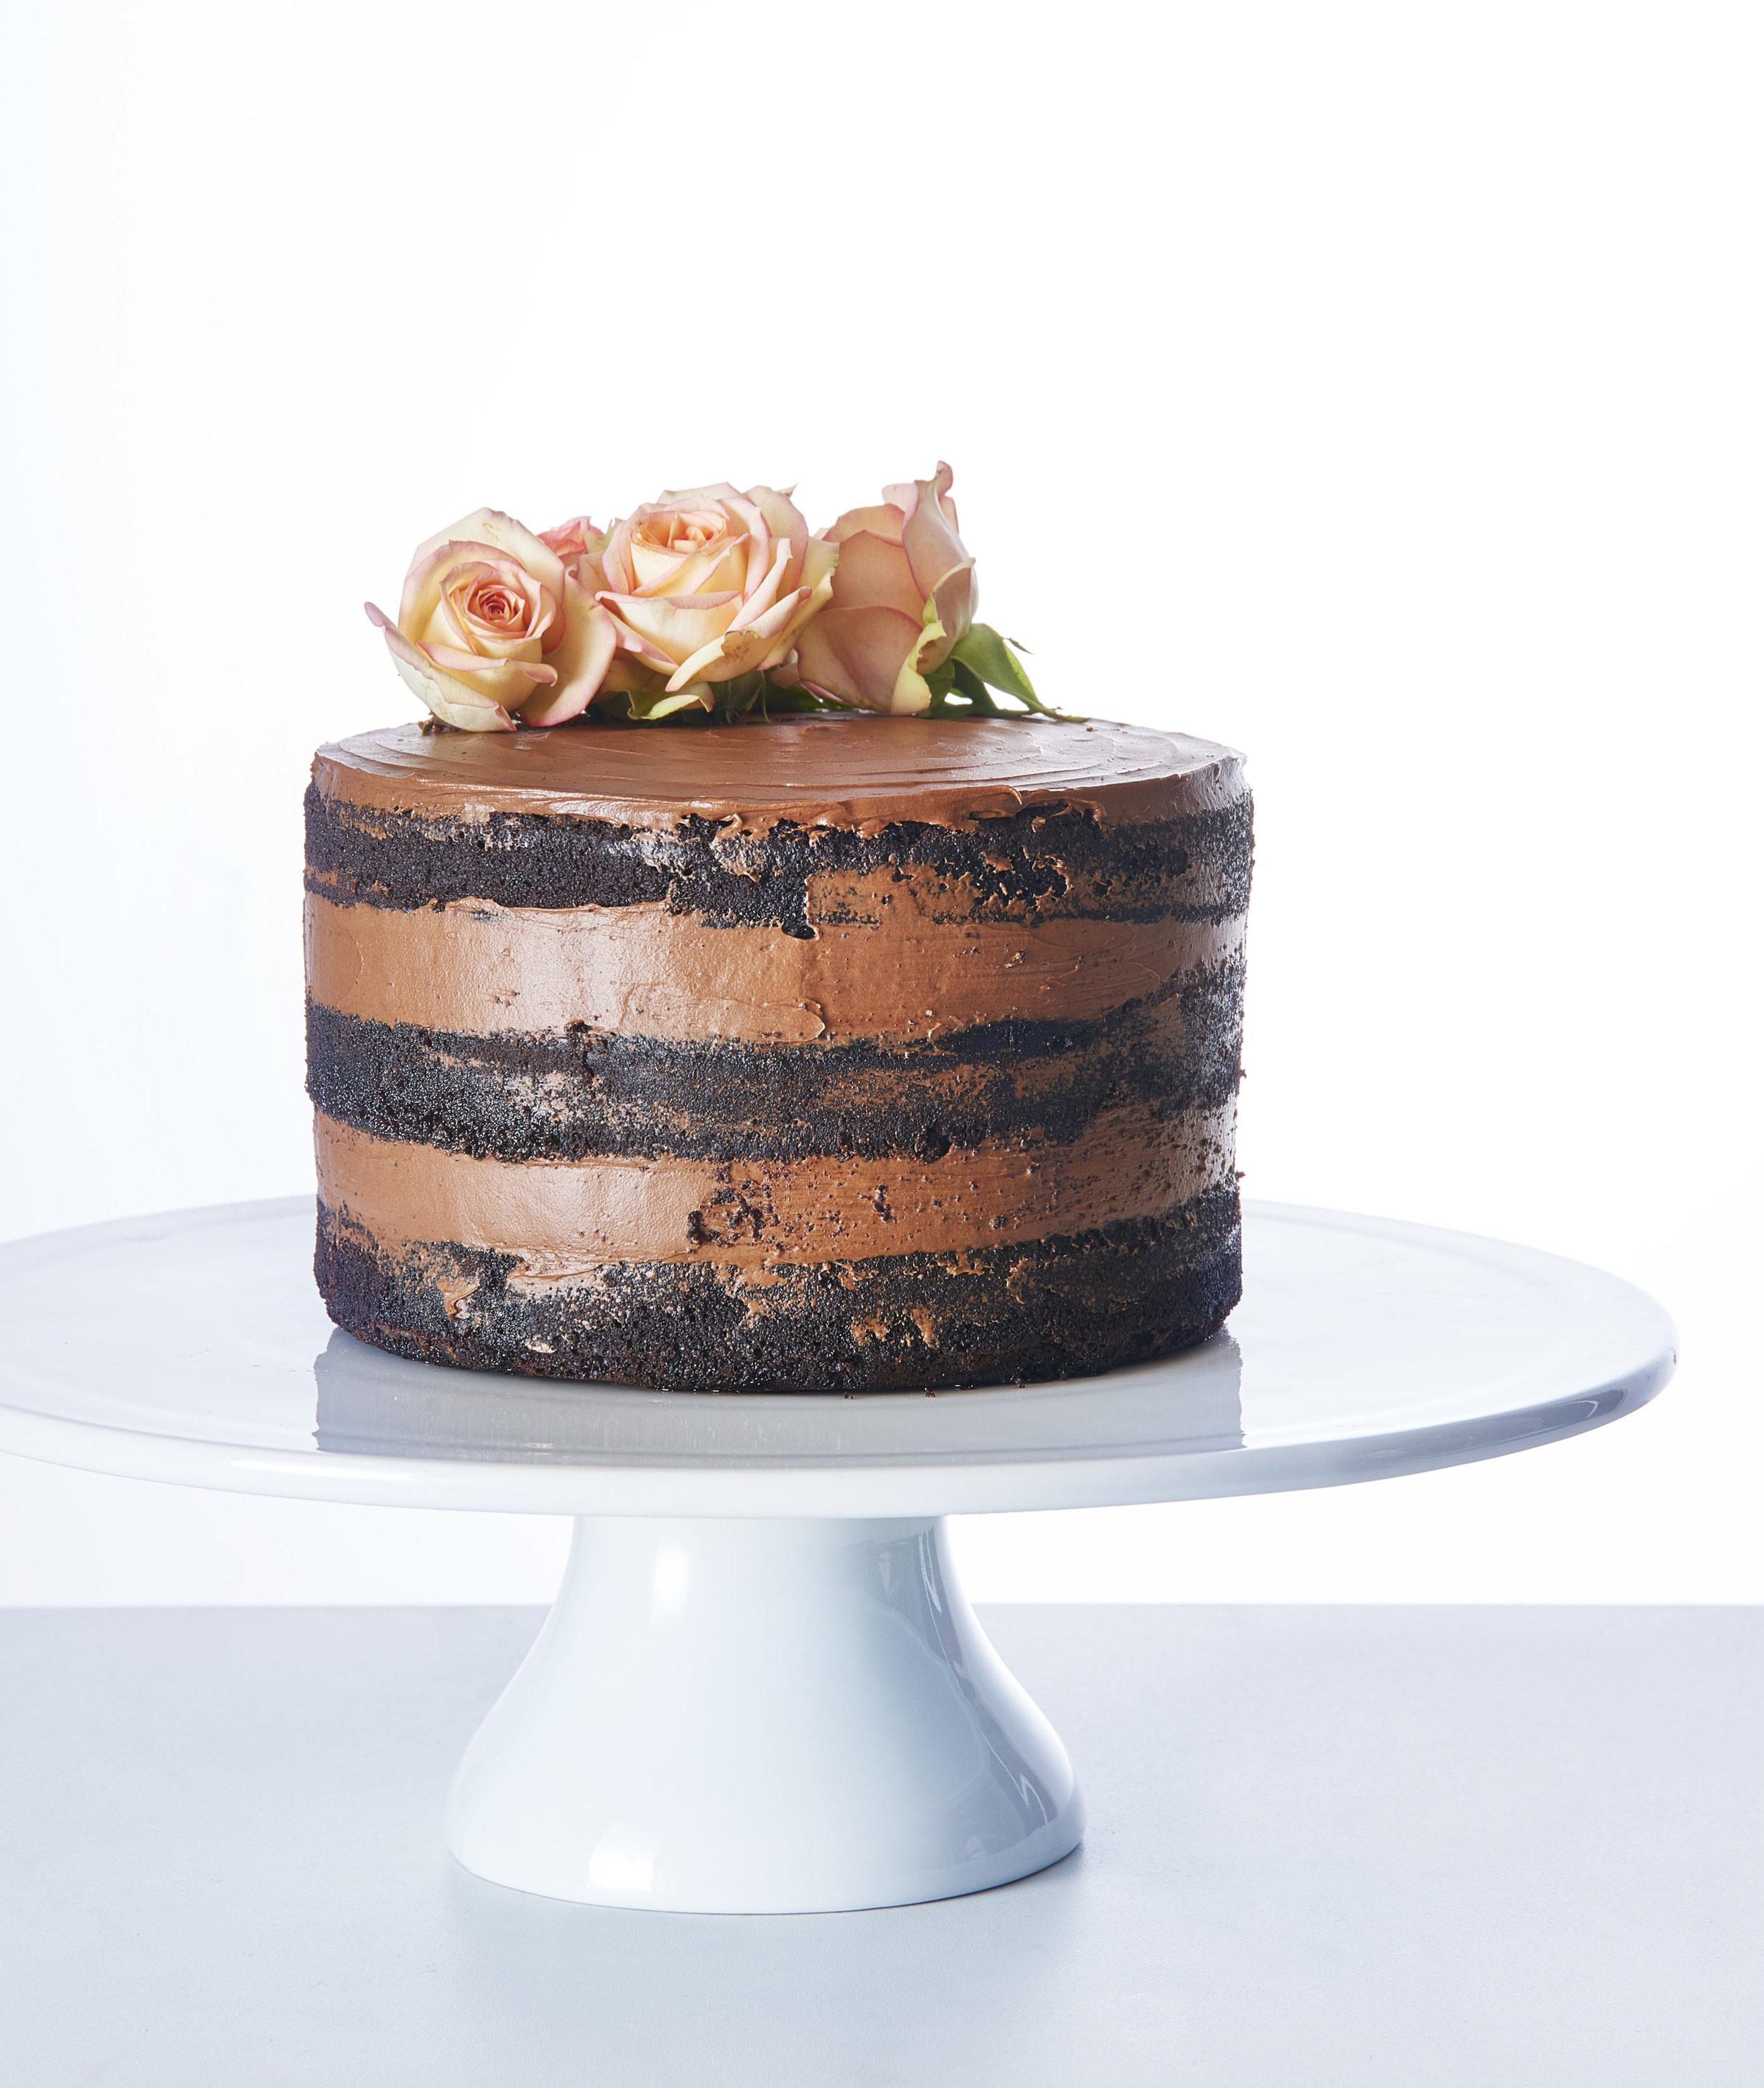 1703_LOVE_AND_CAKE_18-2.jpg